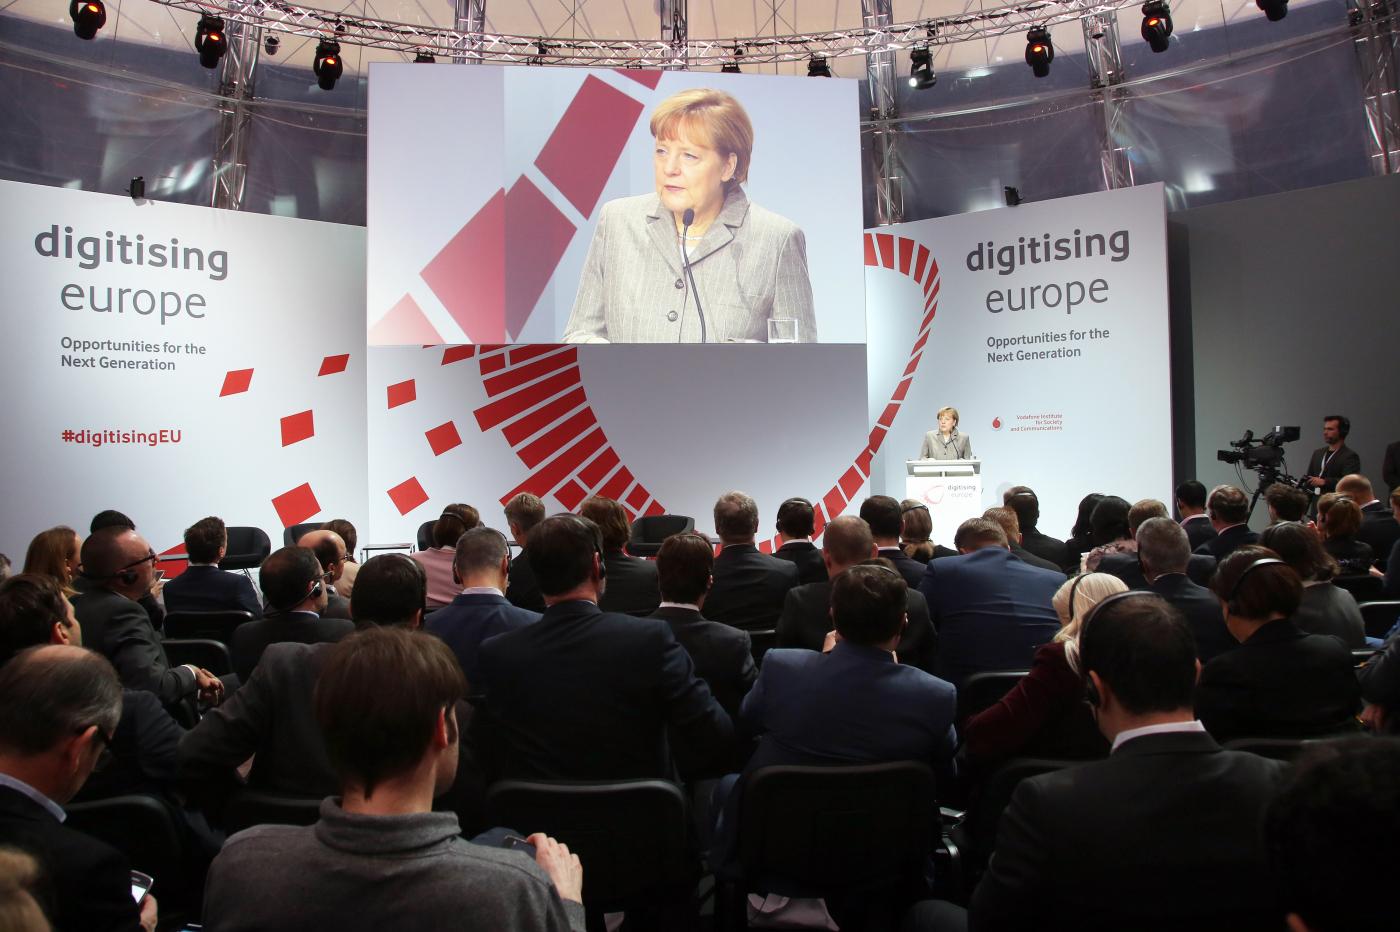 European dialogue on ethics of Big Data